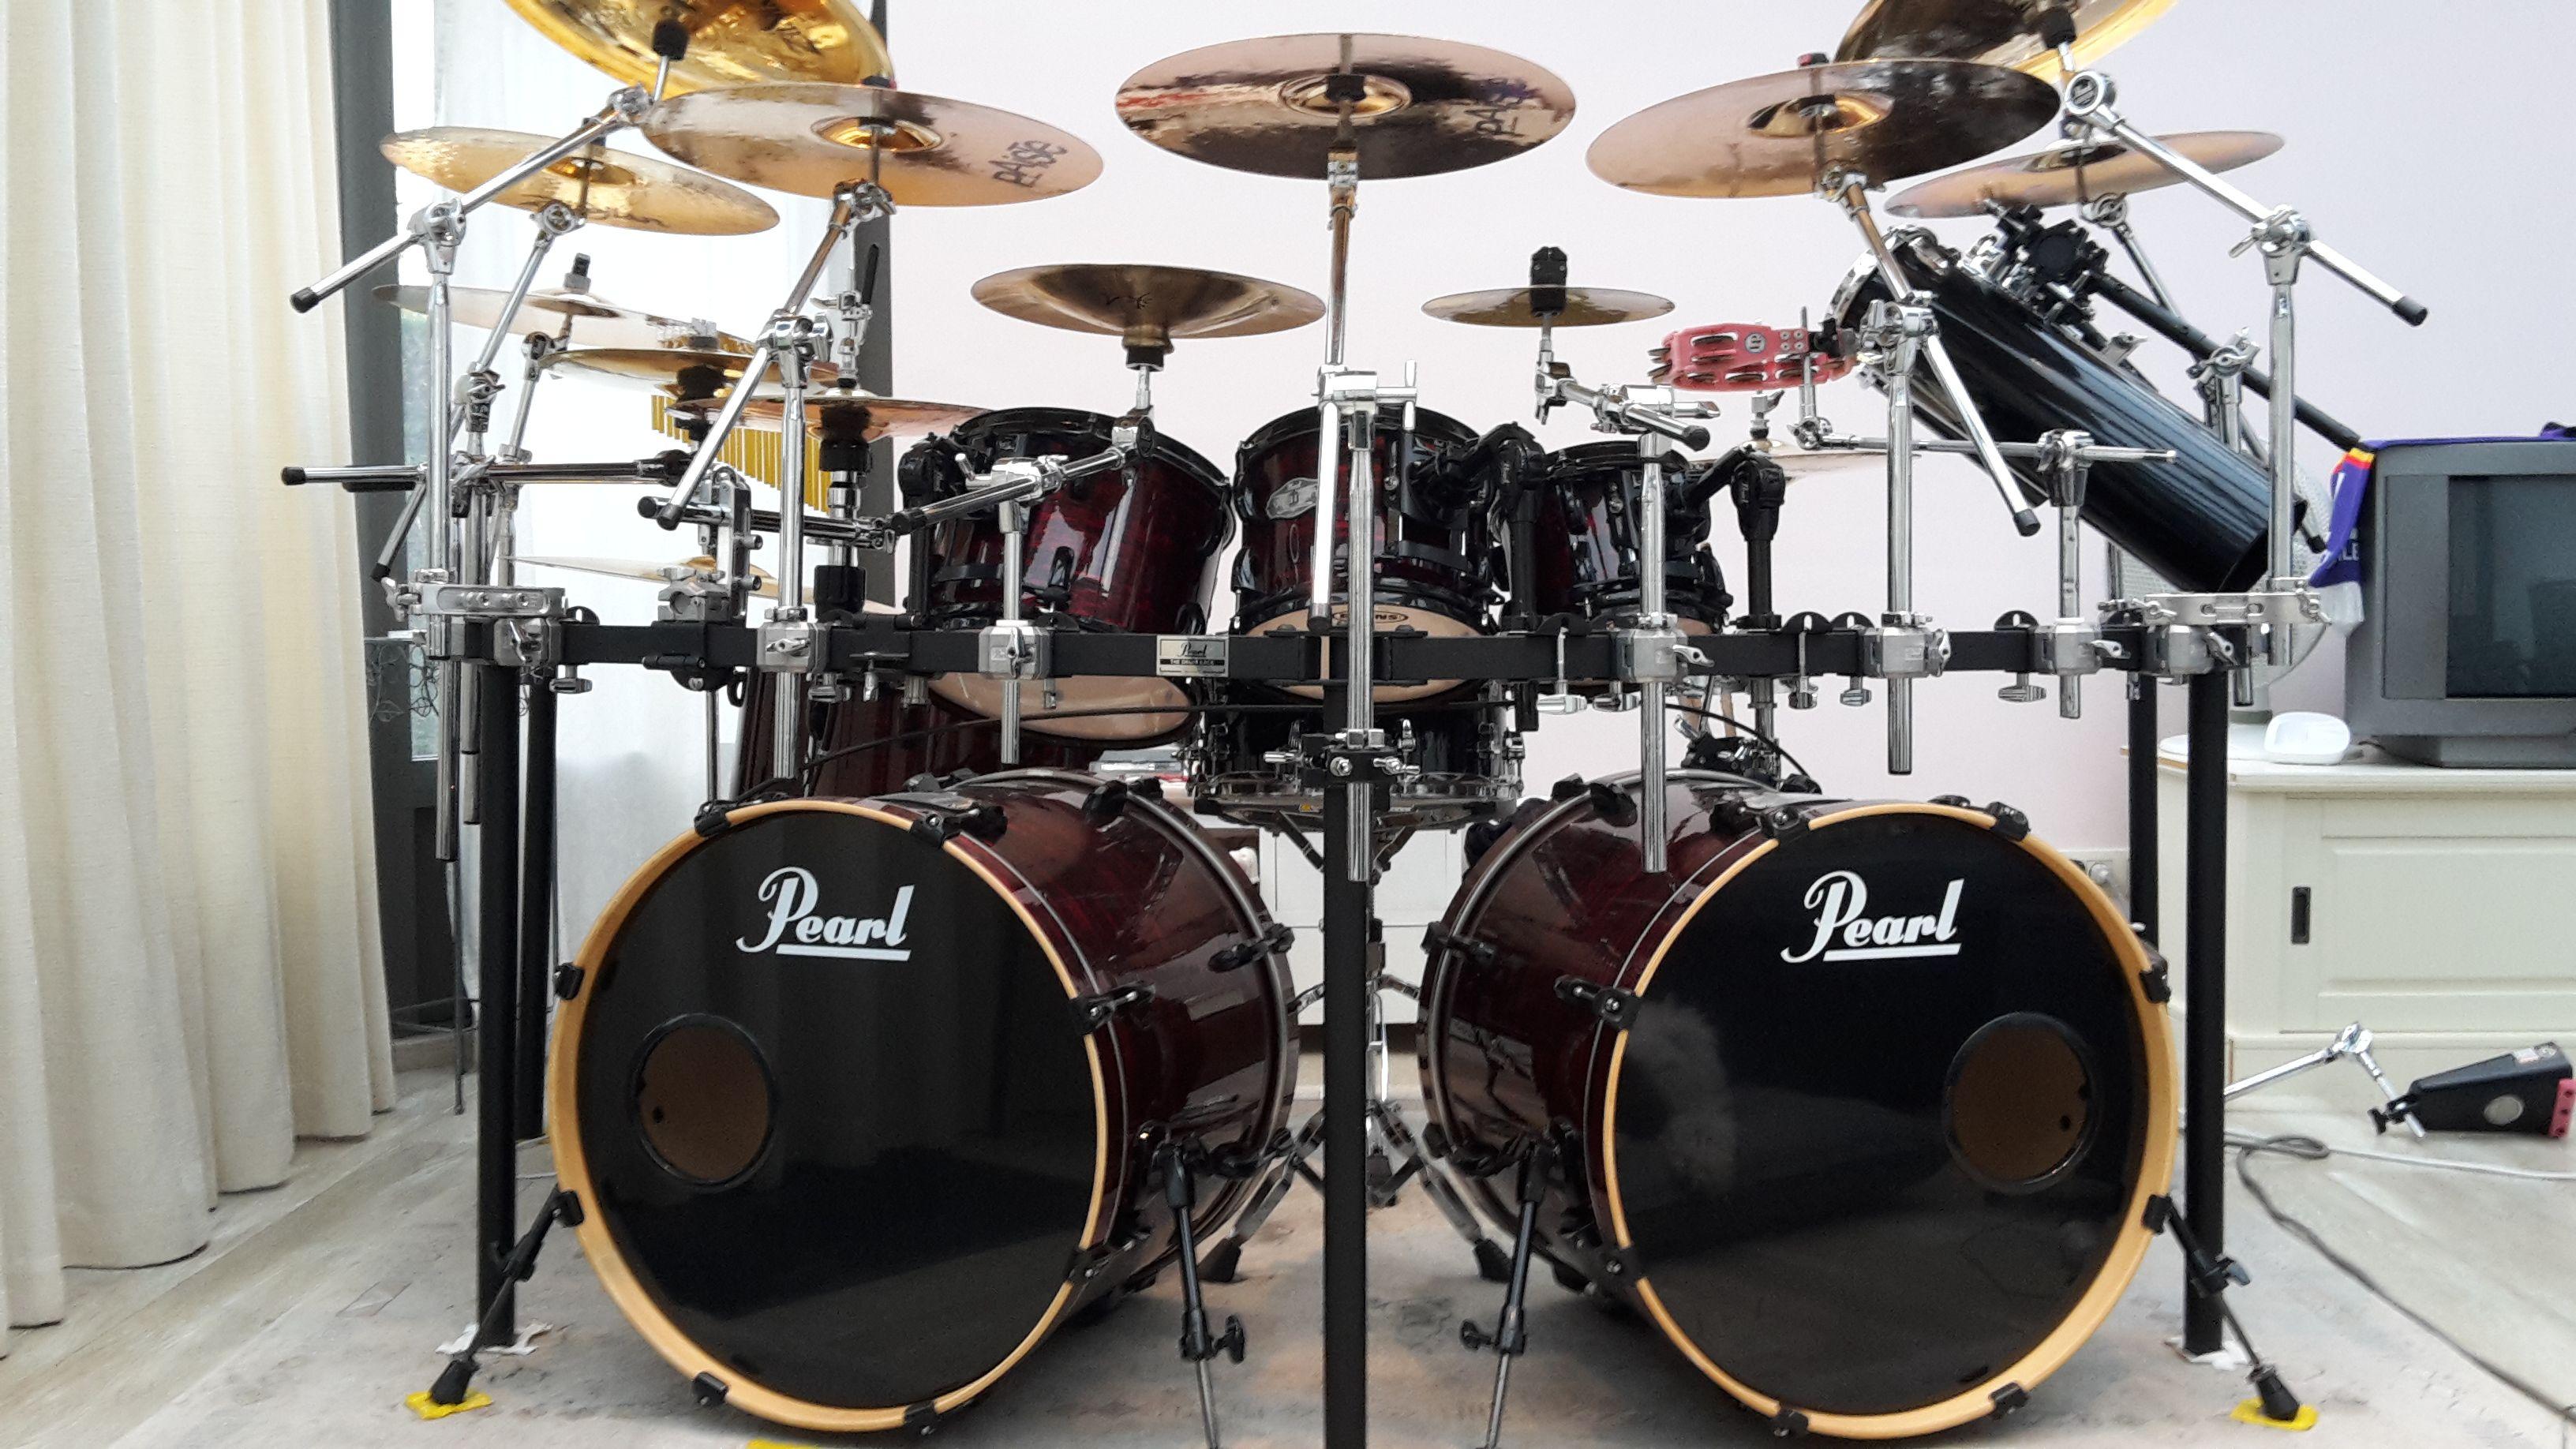 my pearl vision vsx instruments drums pearl drums drum kits. Black Bedroom Furniture Sets. Home Design Ideas